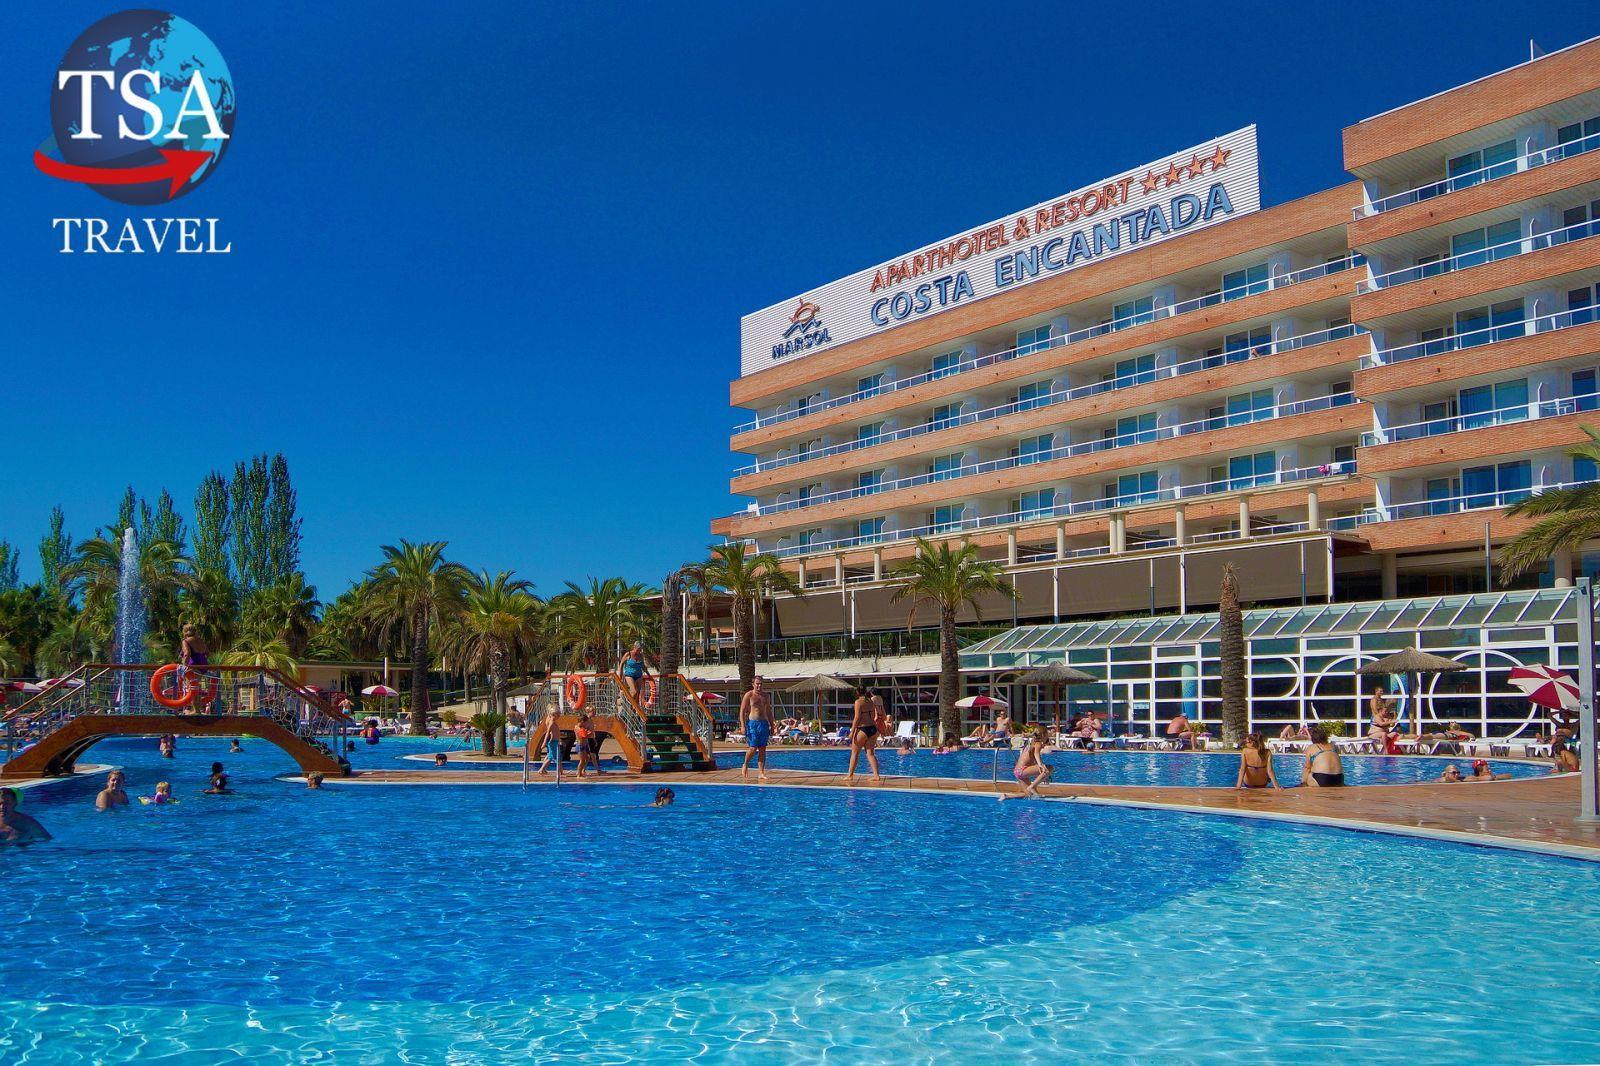 Costa-Enacantada-Spain-001.jpg